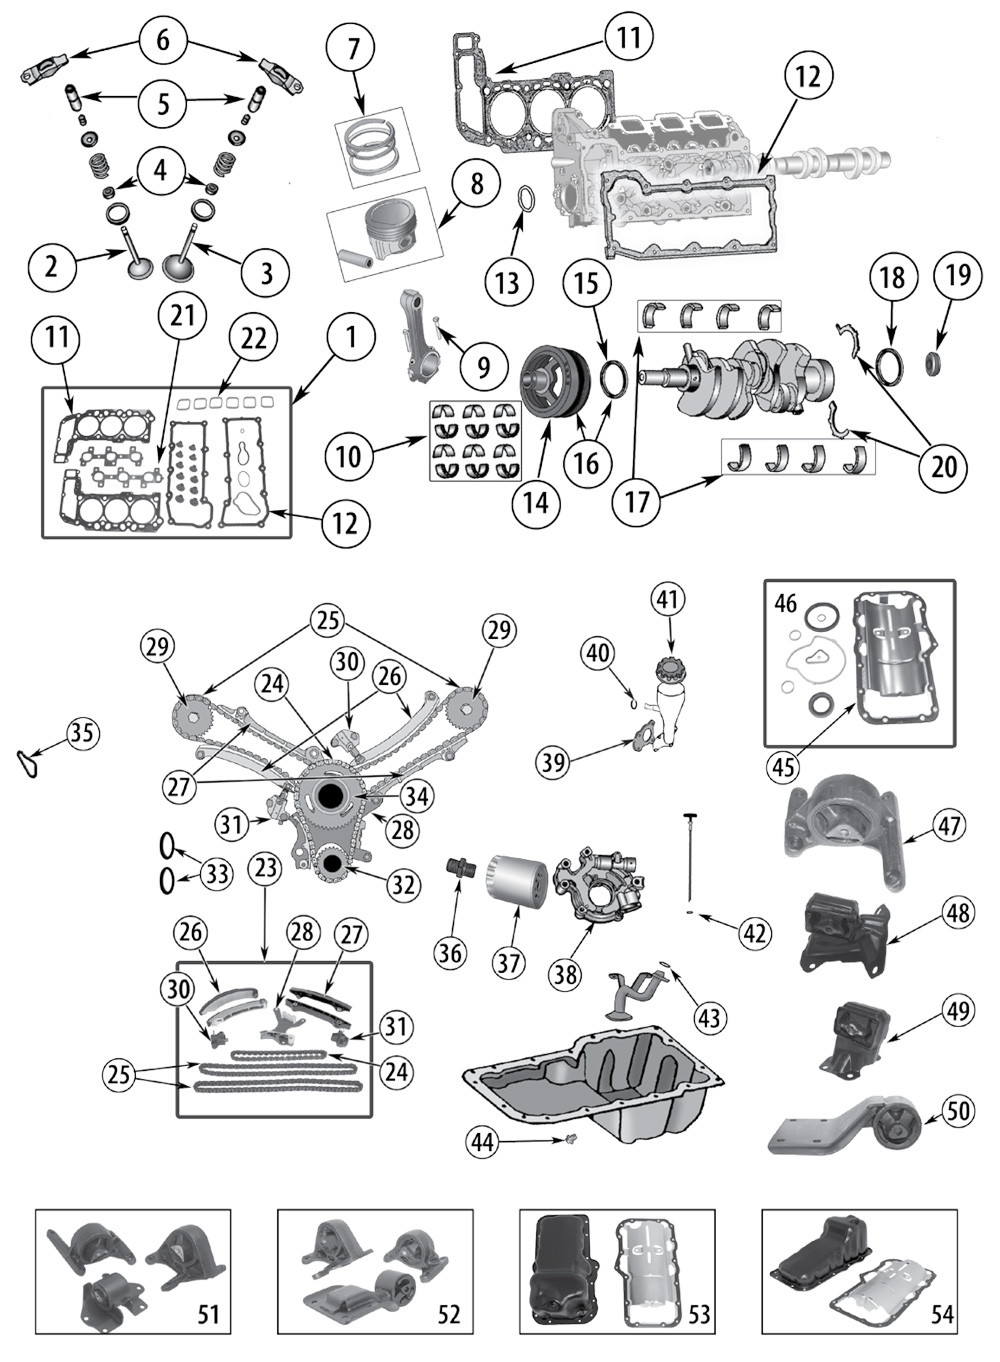 Diagrama Delmotor De Liverti 3.7 Jeep Kj 2003 Explosionszeichnung 3,7 Liter Motor Daimler-chrysler Jeep Kj … Of Diagrama Delmotor De Liverti 3.7 Jeep Kj 2003